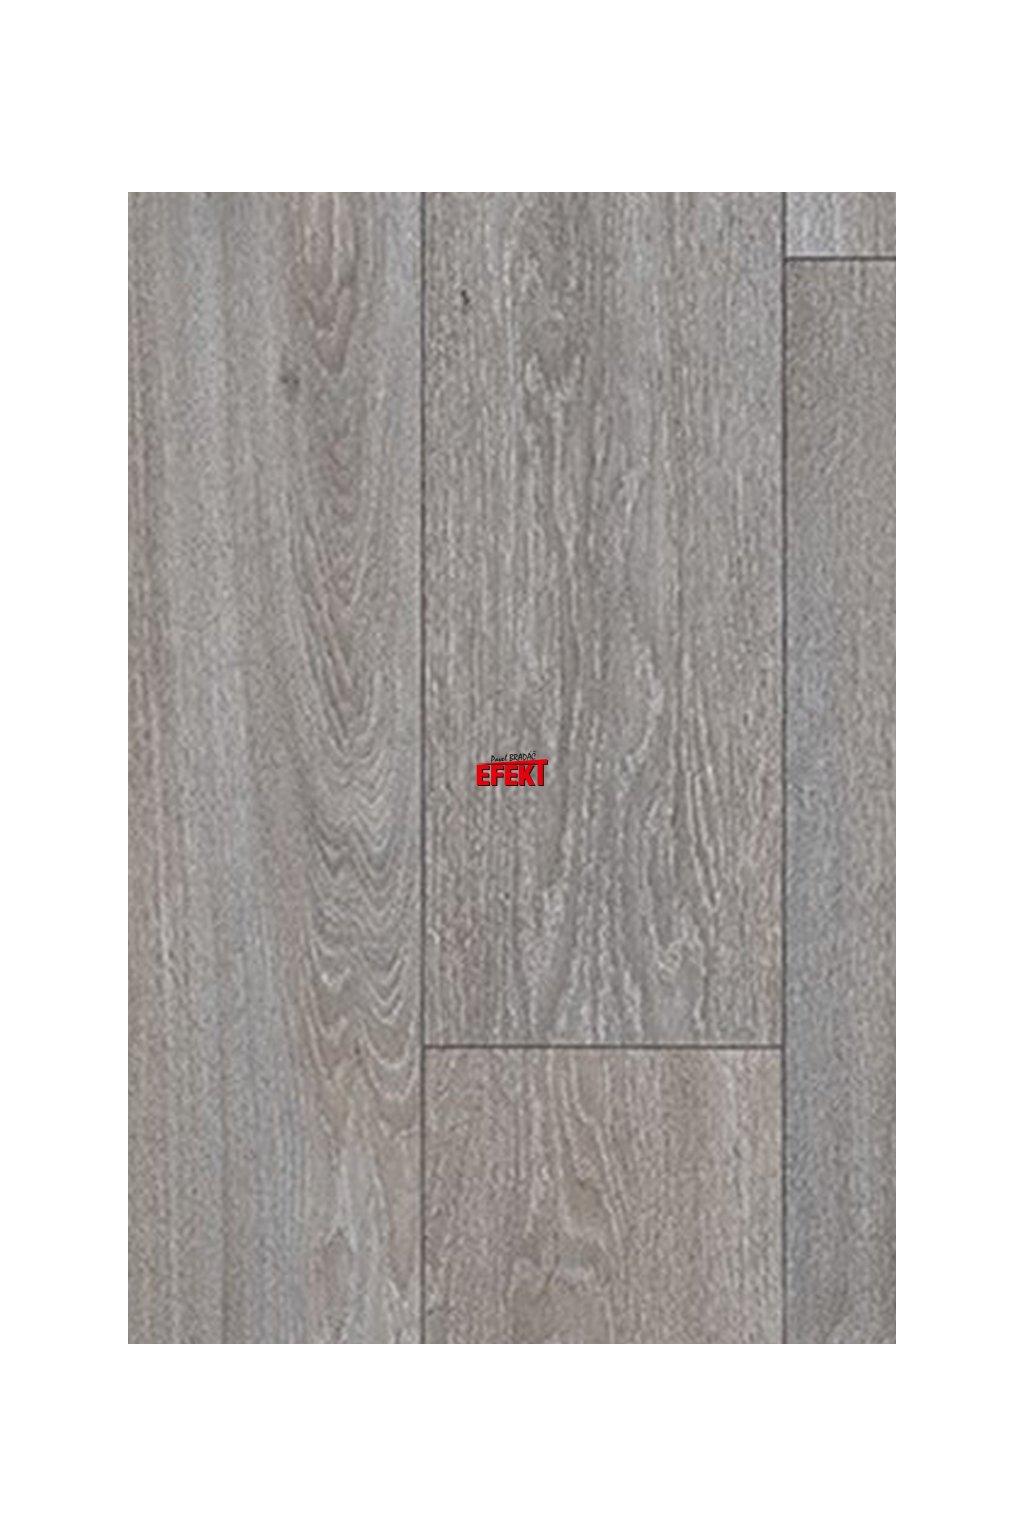 Ambient-Havana Oak 991M